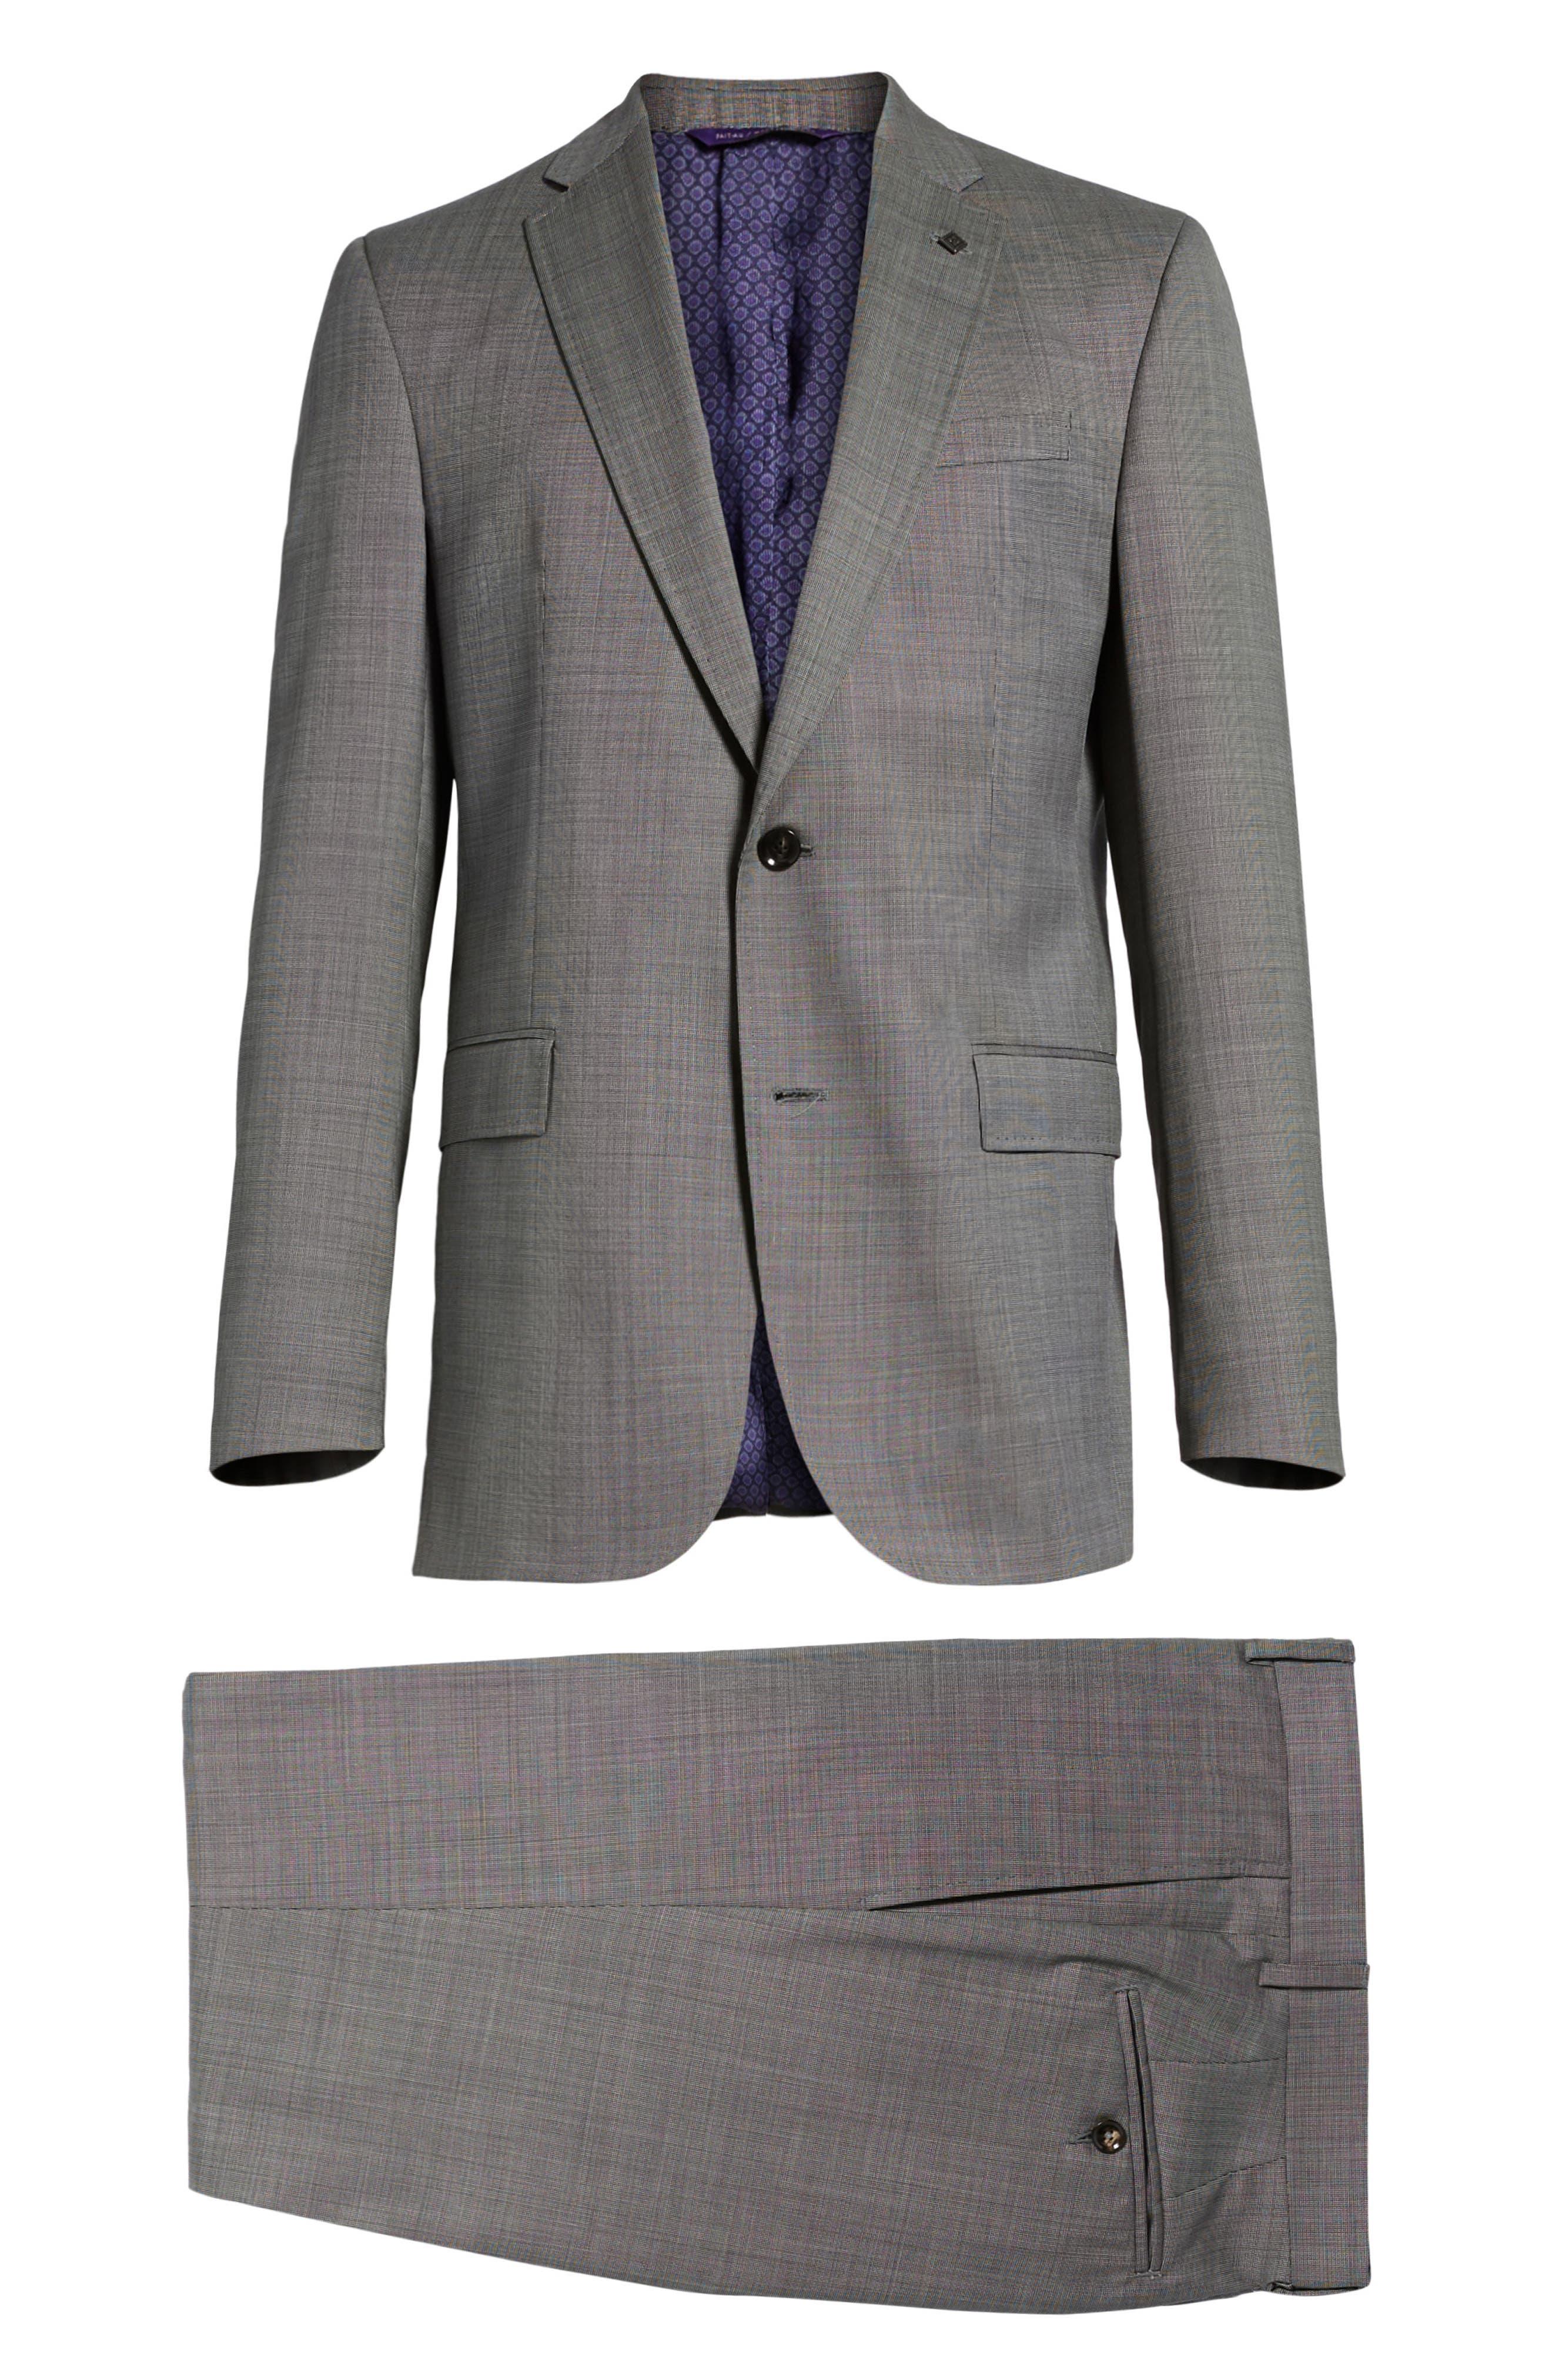 Jay Trim Fit Solid Wool Suit,                             Alternate thumbnail 13, color,                             LIGHT GREY